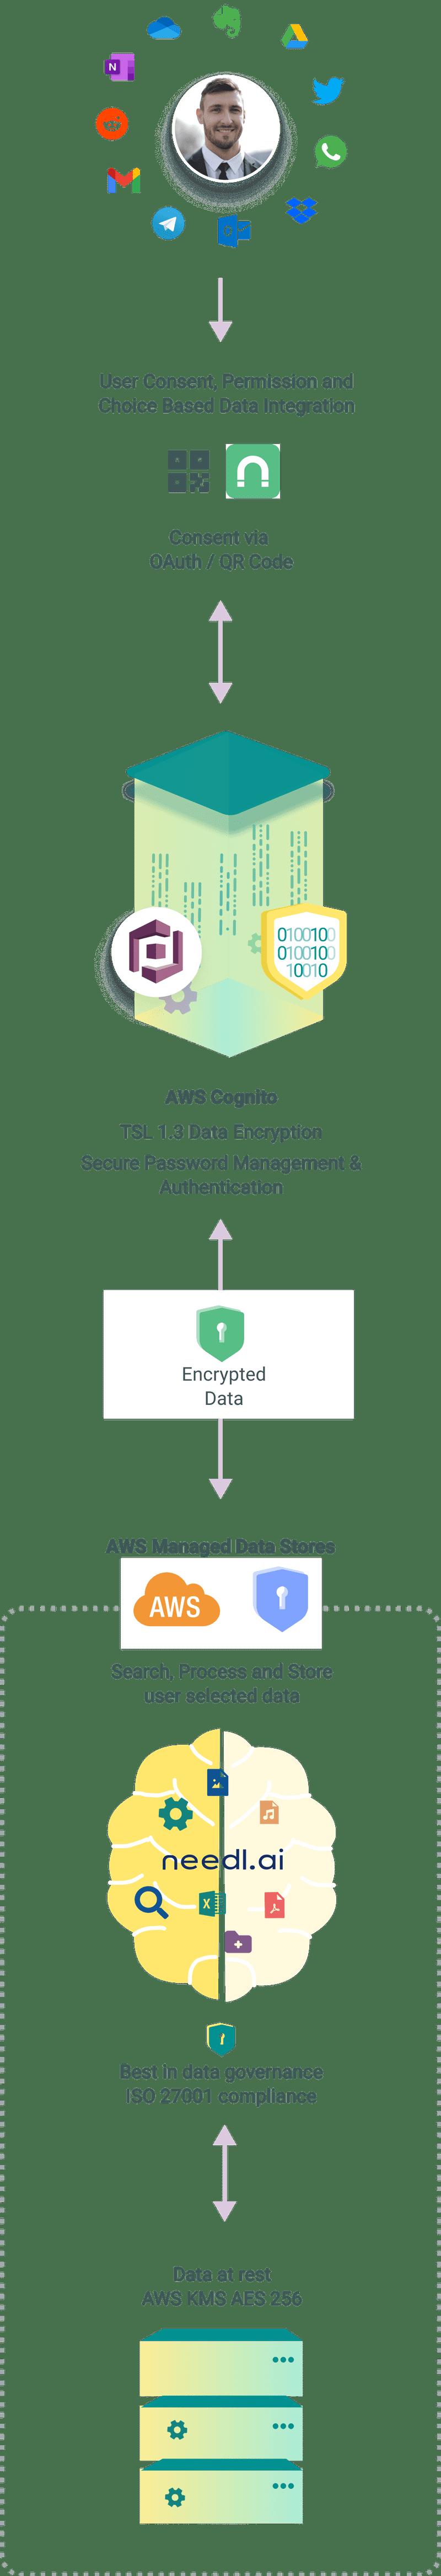 Needl AI Enterprise Data Protection